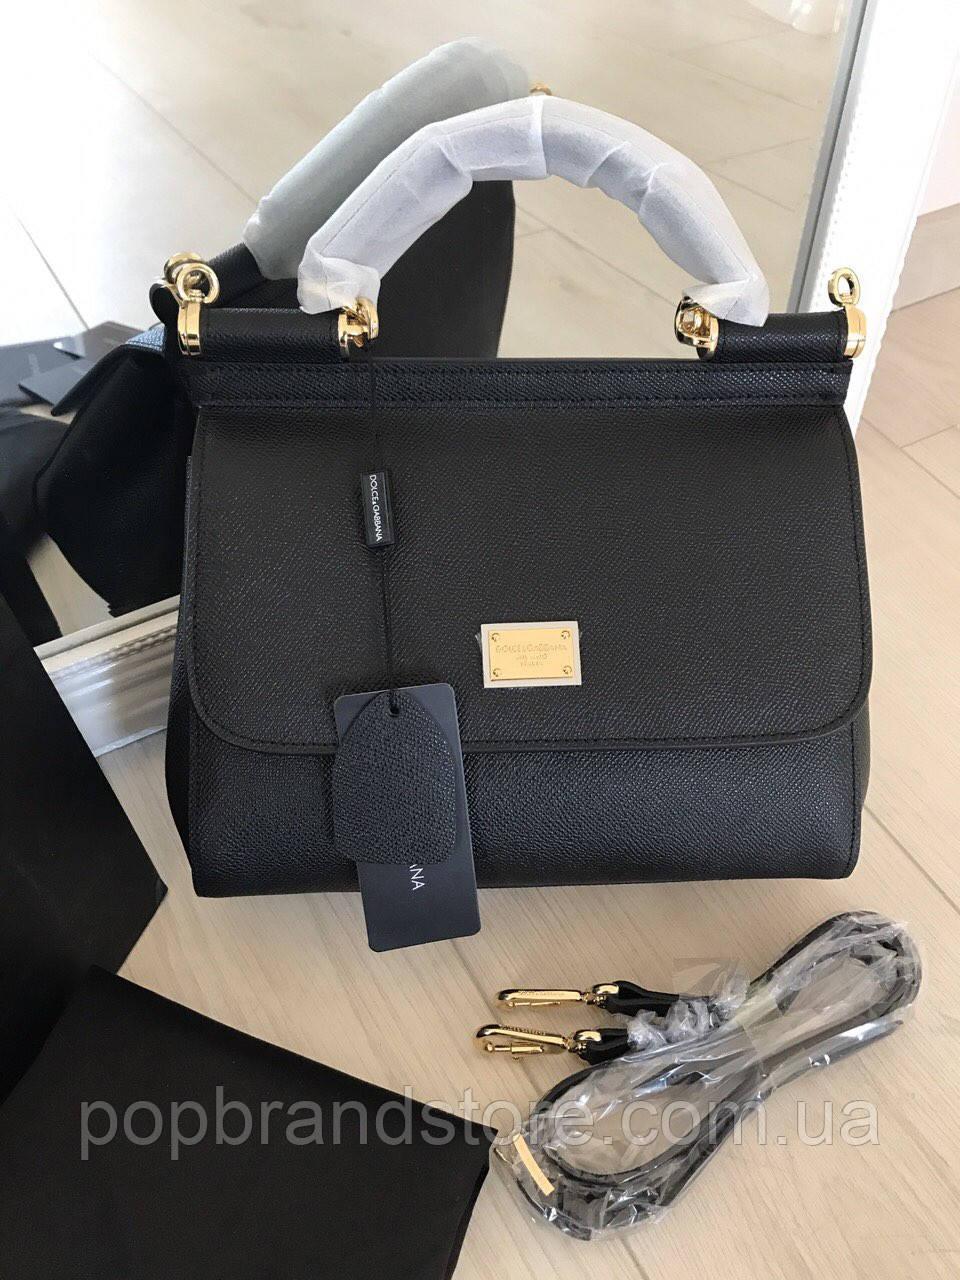 Еллегантная женская сумочка DOLCE GABBANA